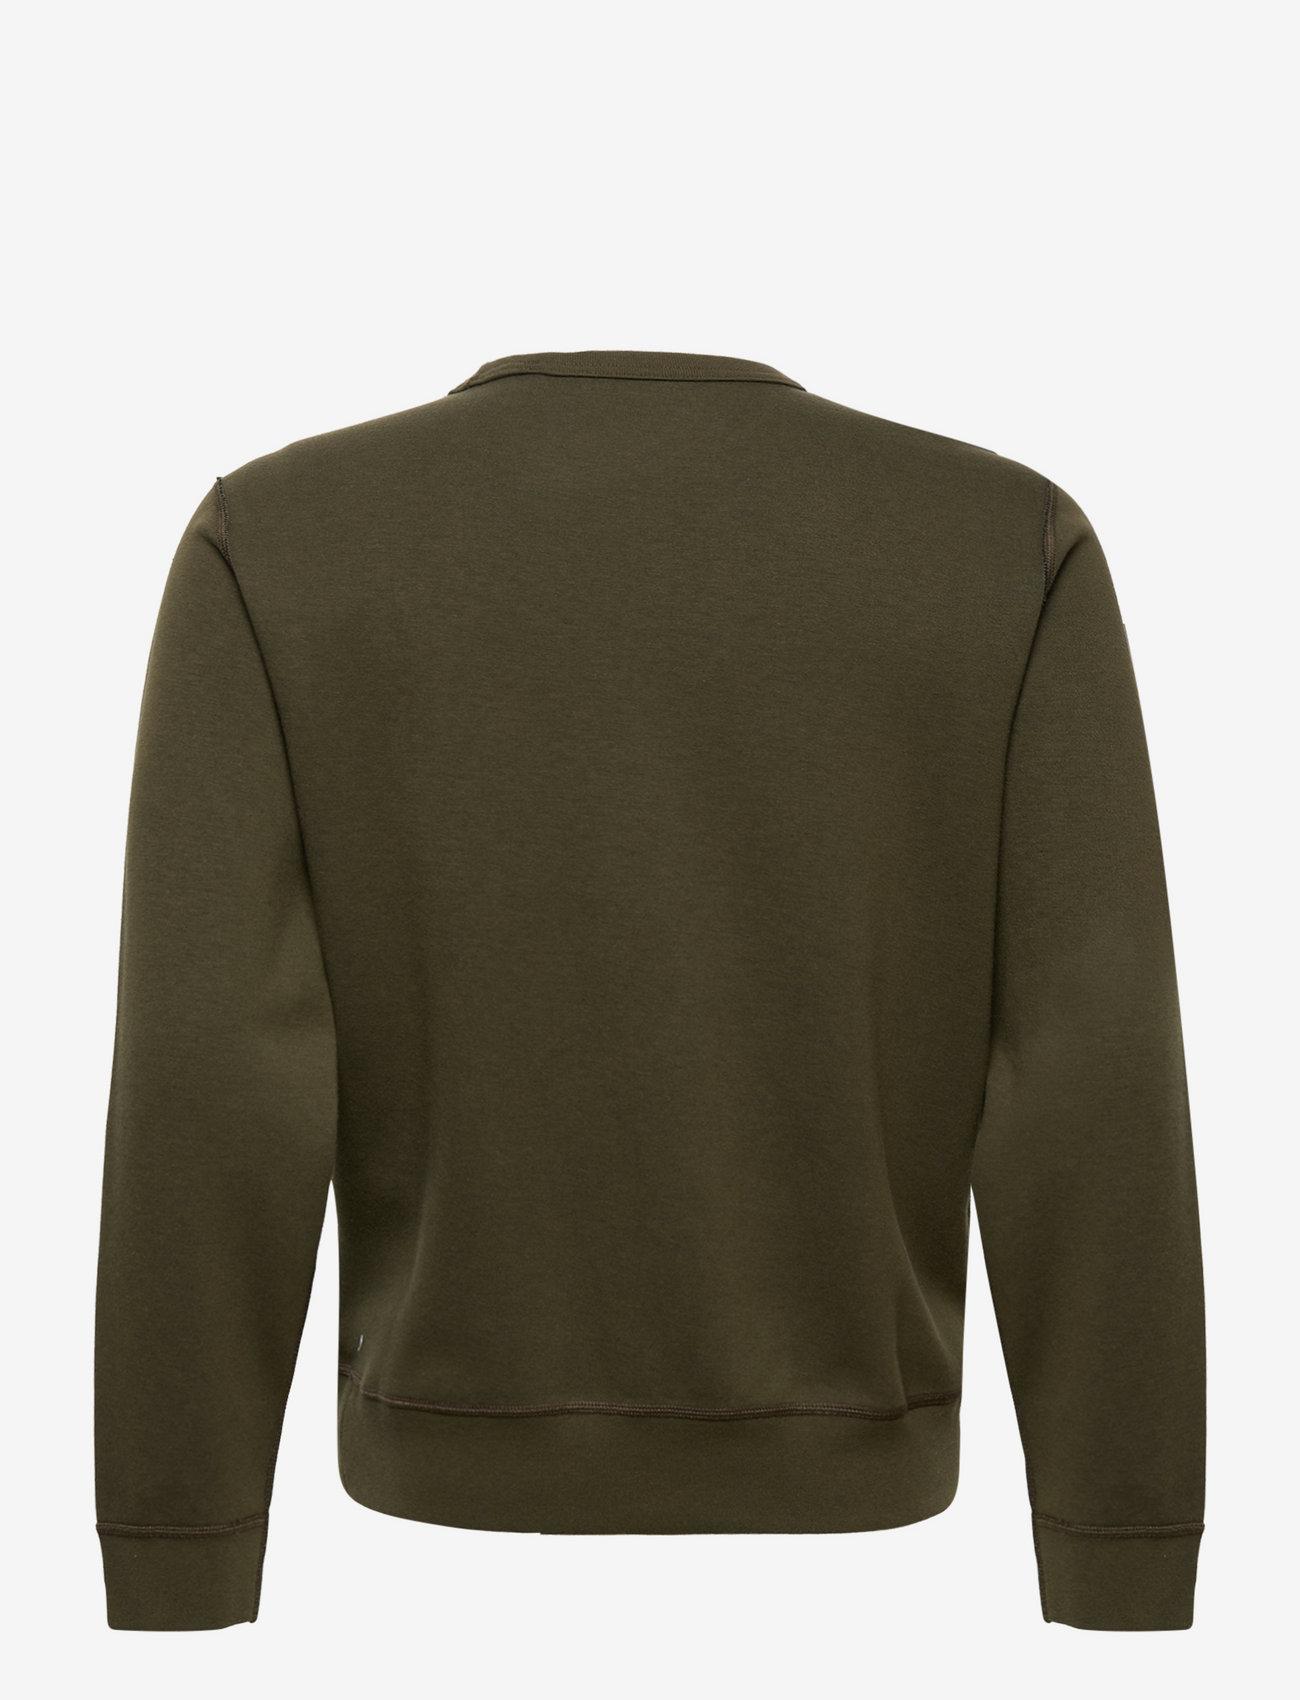 Double-knit Sweatshirt (Company Olive/c97) - Polo Ralph Lauren U1kSKG